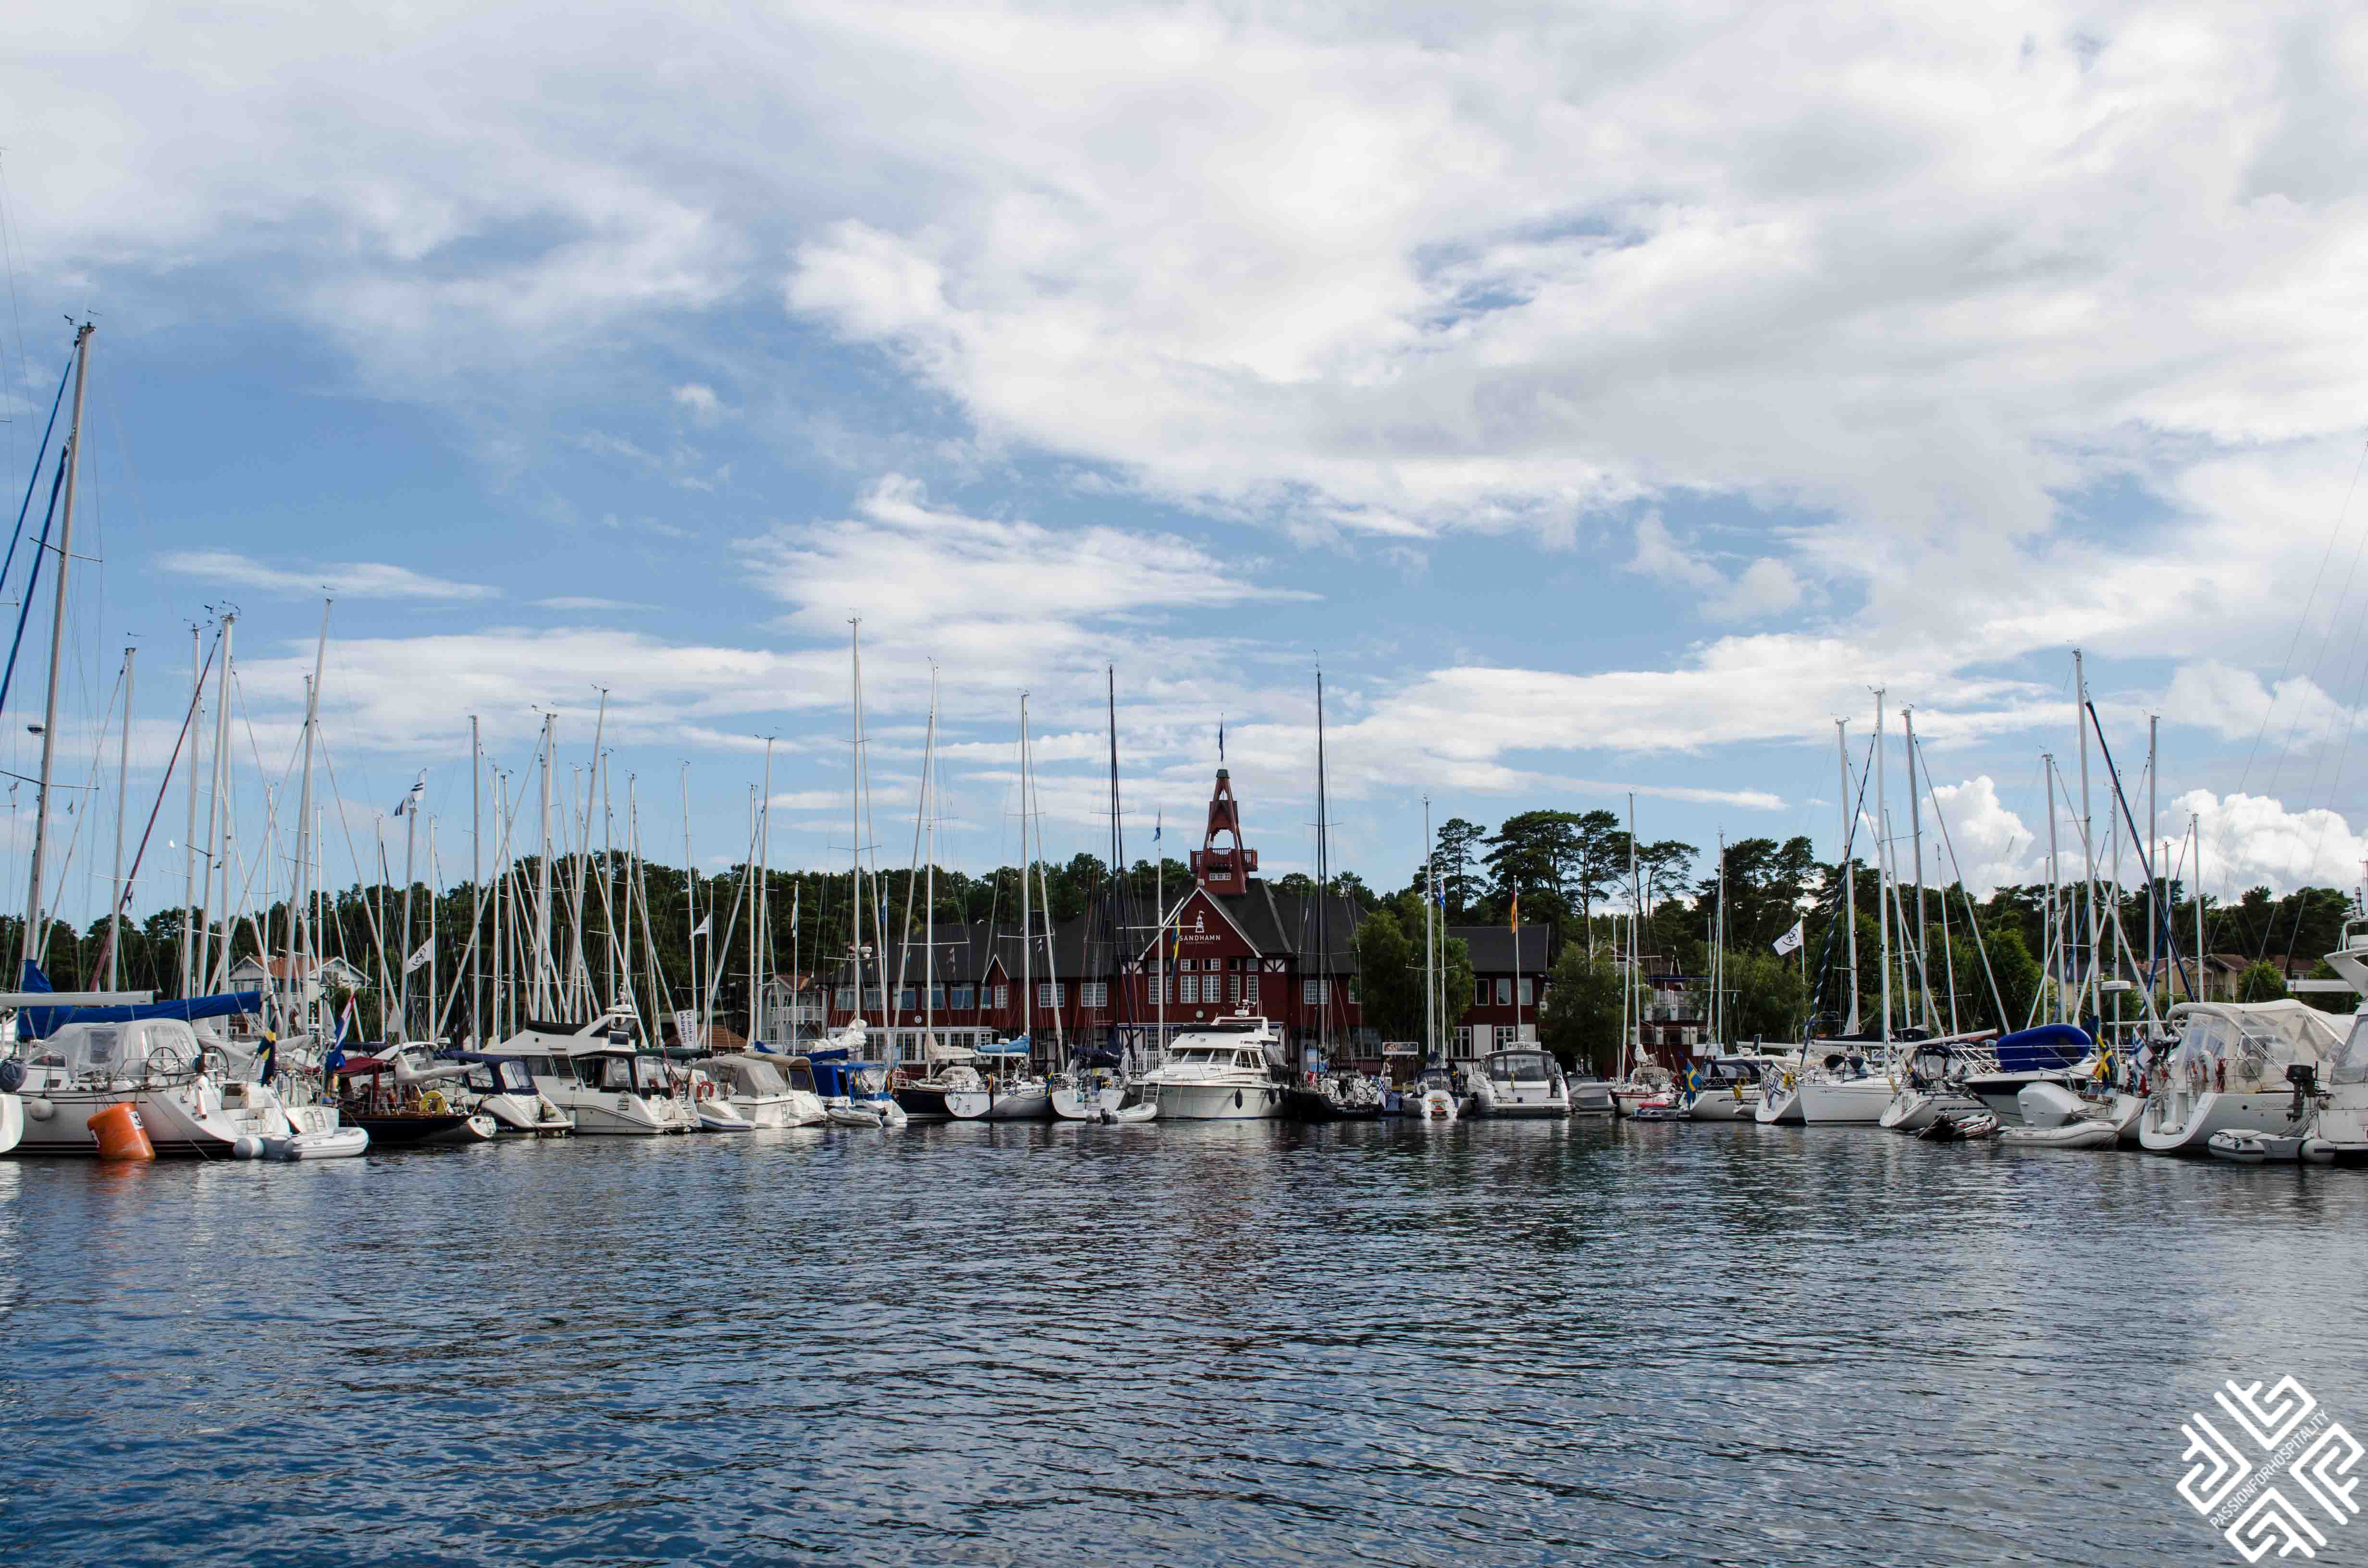 stockholm_archipelago_sandhamn-2